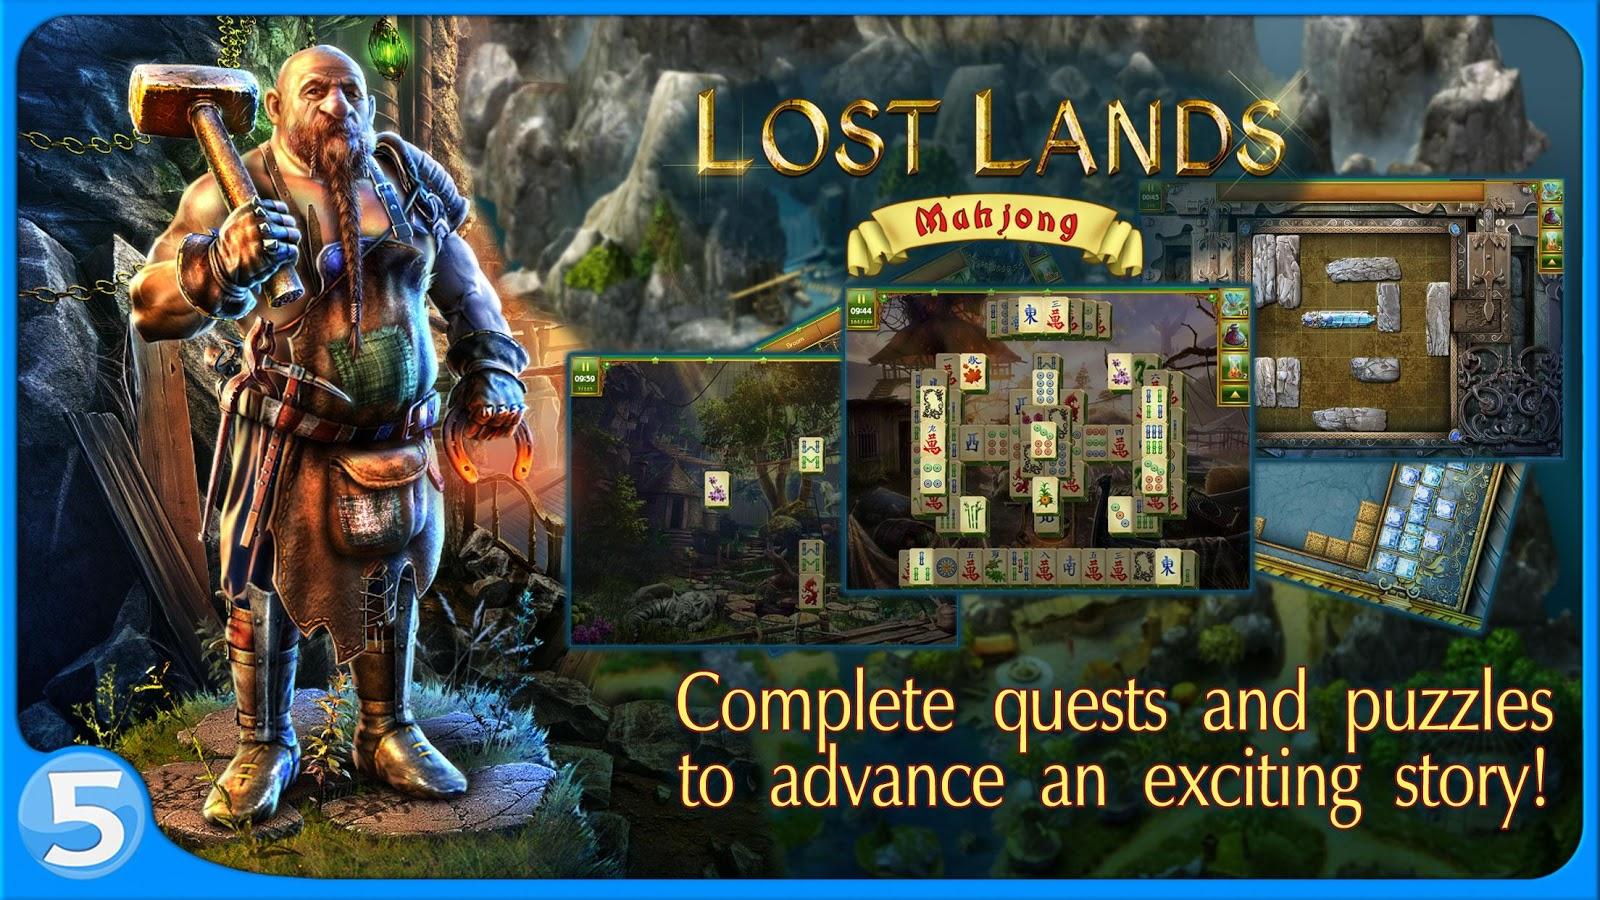 High Resolution Wallpaper | Lost Lands 1600x900 px